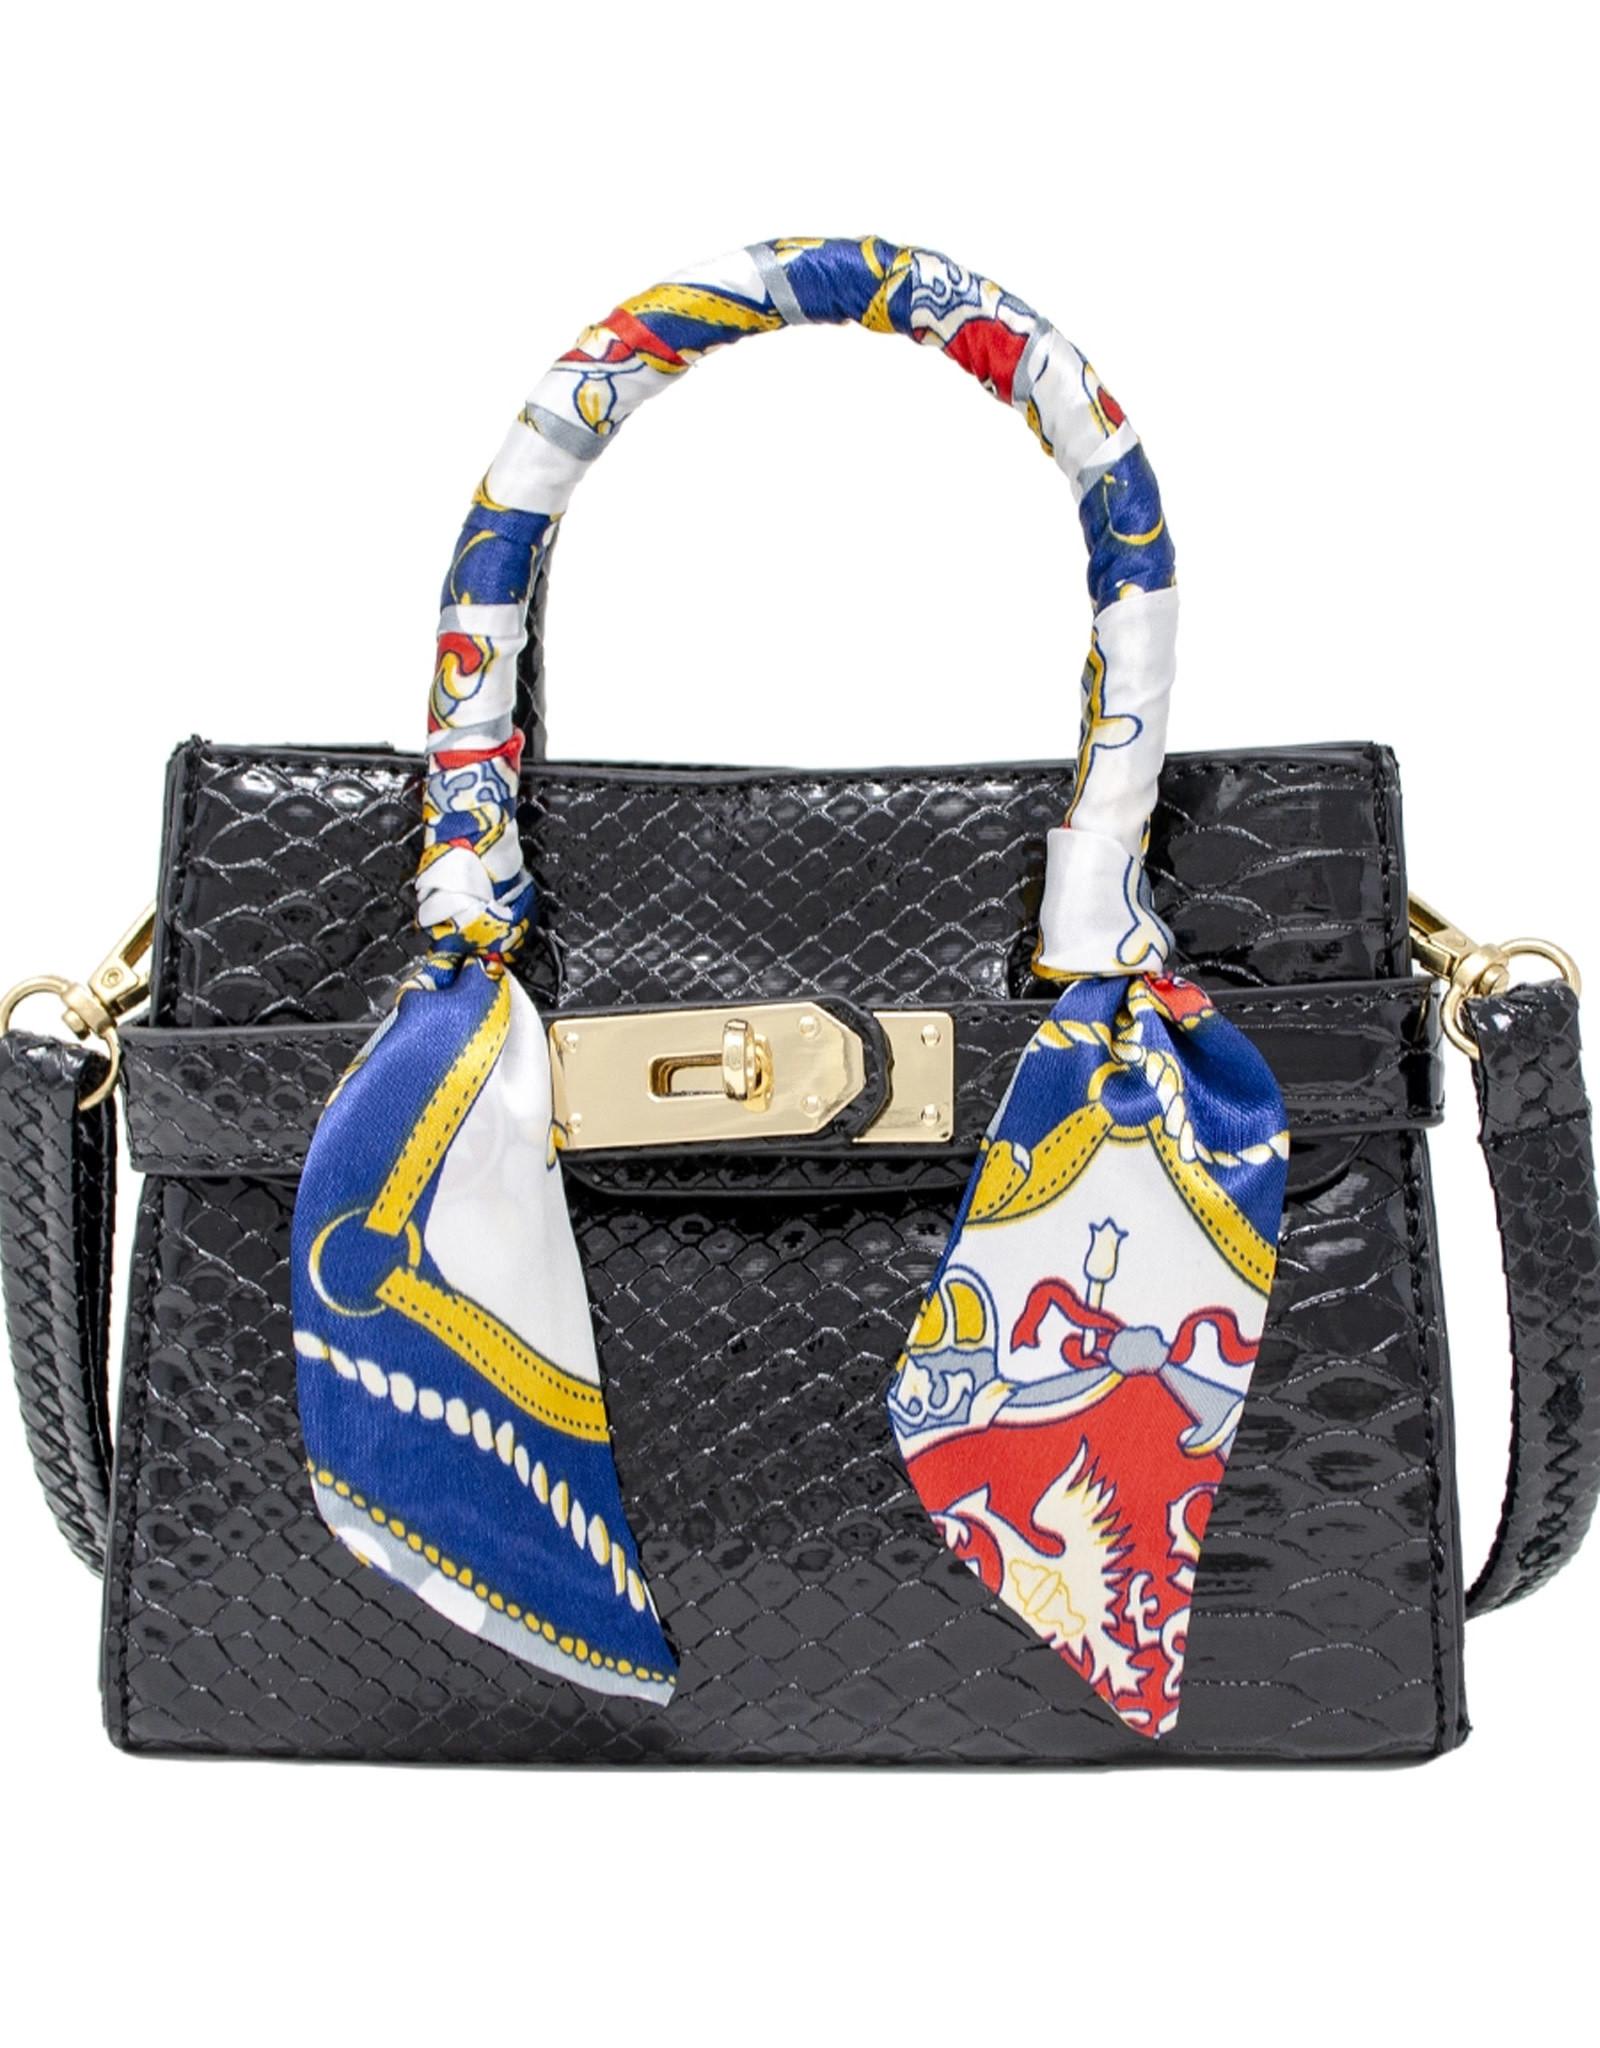 Tiny Treats & Zomi Gems Patent Crocodile Scarf Handbag Black